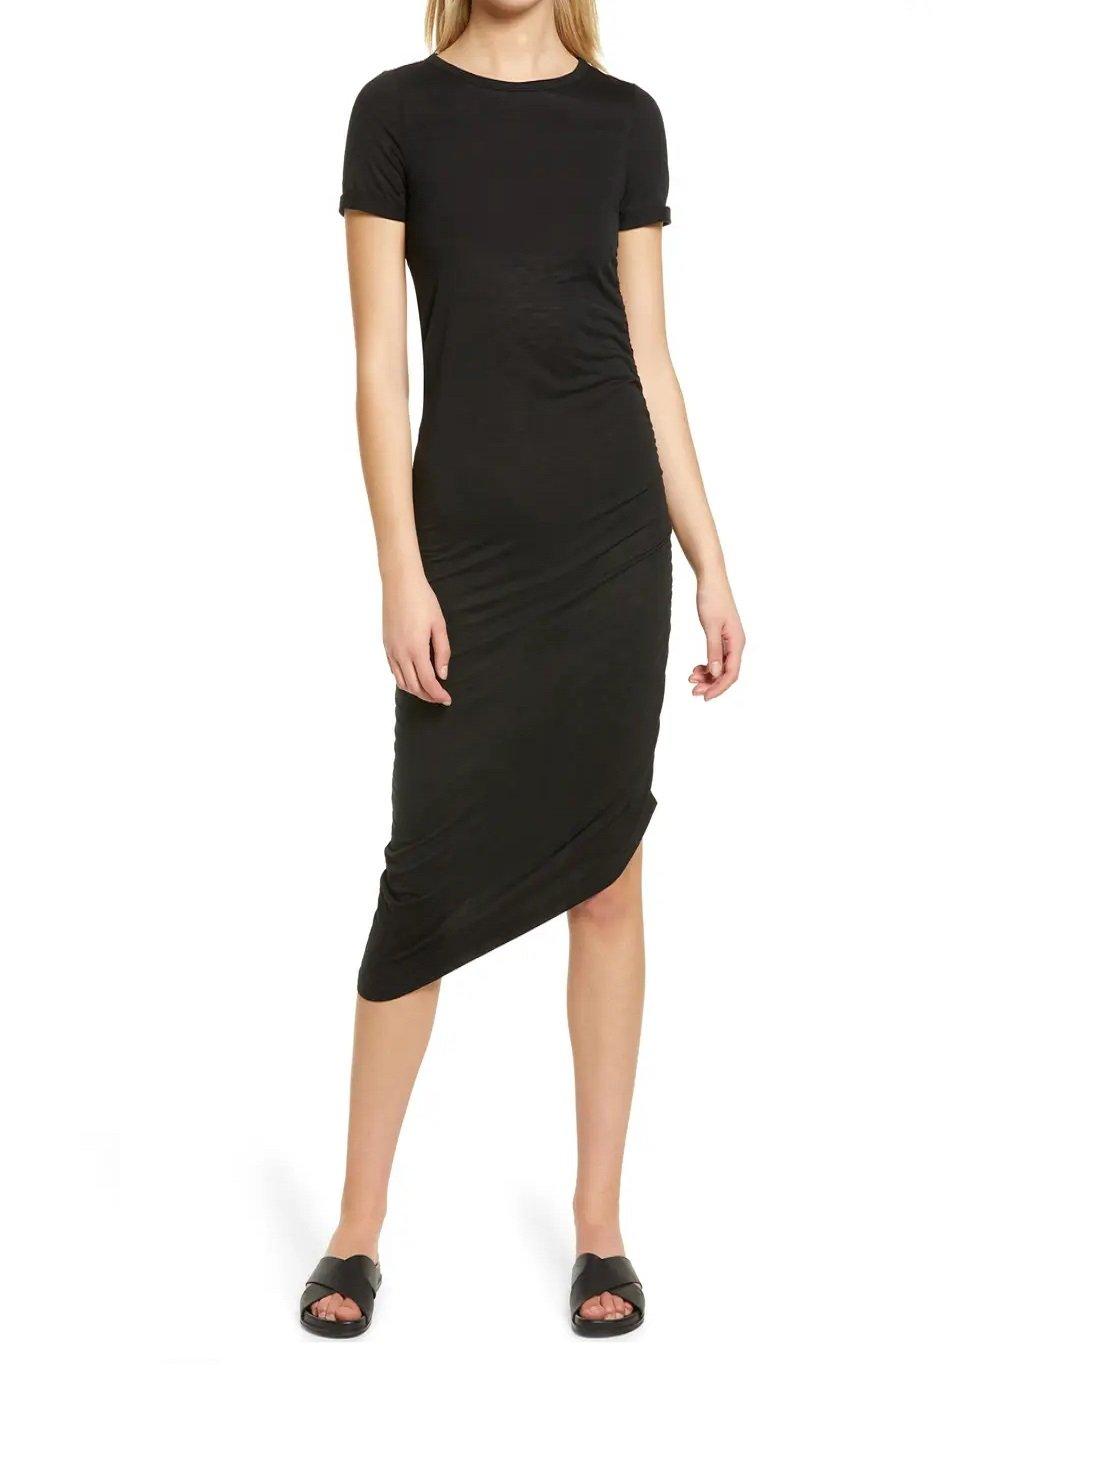 Asymmetrical Ruched T-Shirt Dress